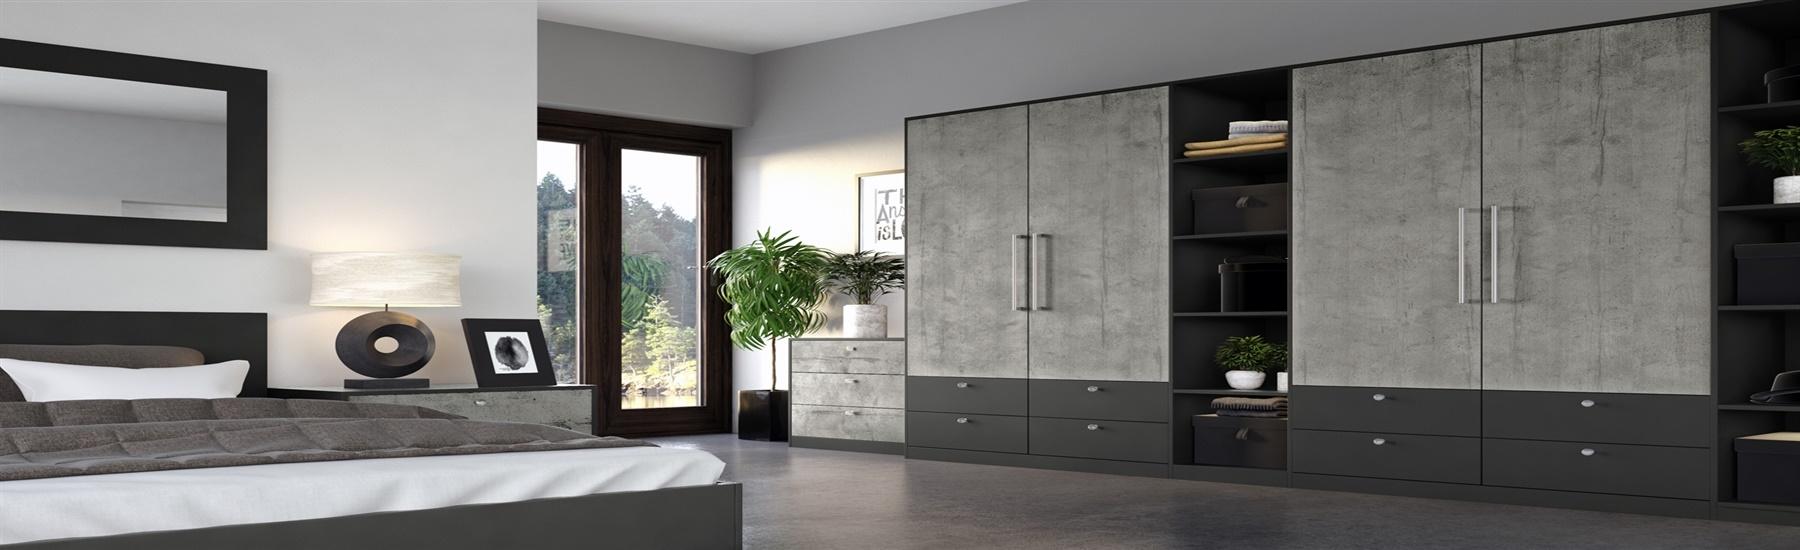 boston-concrete-wardrobe-doors